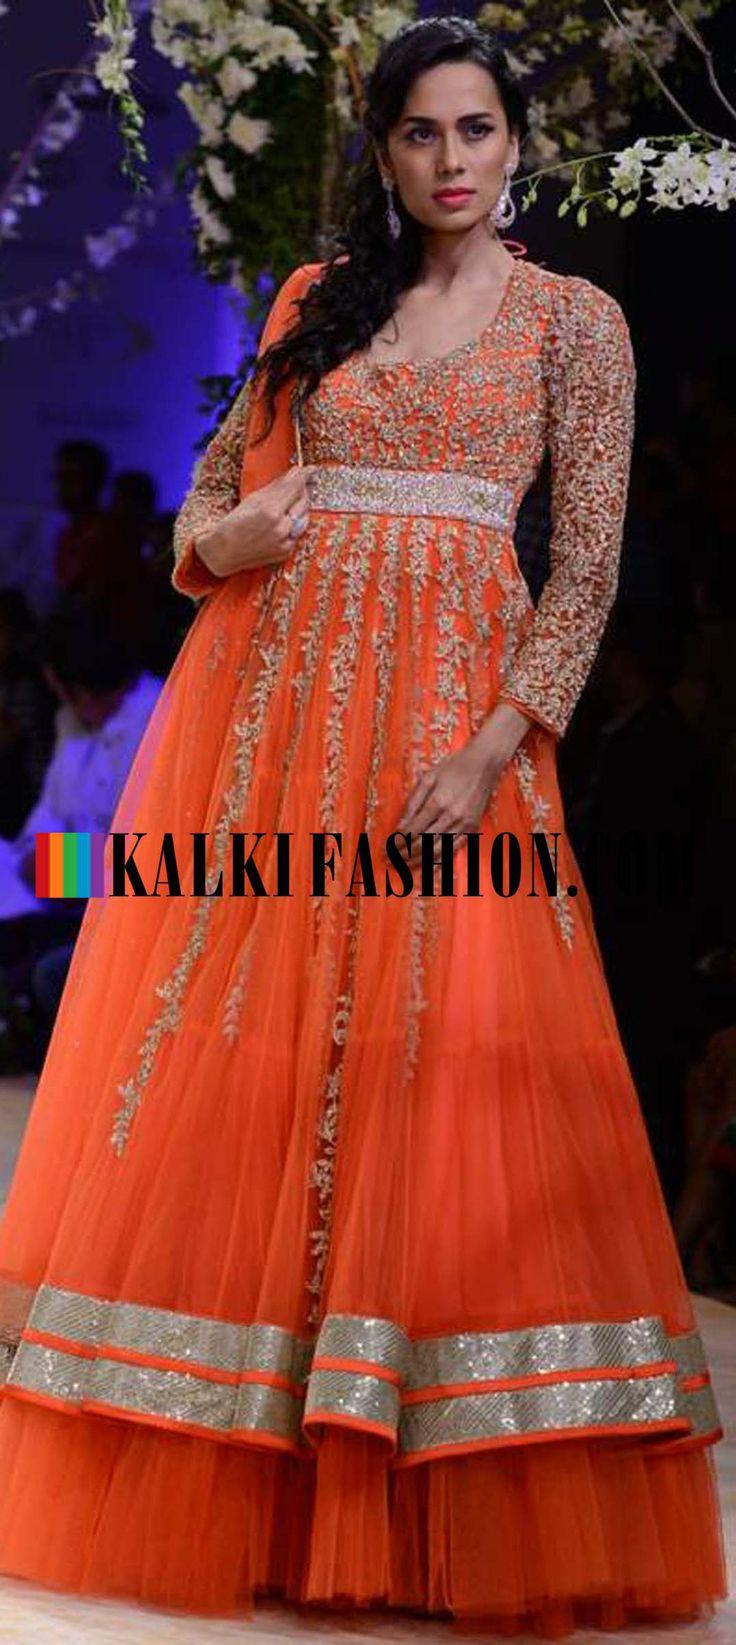 http://www.kalkifashion.com/designers/jyotsna-tiwari.html Urnashi Rautela and other models walk the ramp for Jyotsna Tiwari at Indian Bridal Week NOV 2013 at Mumbai 57